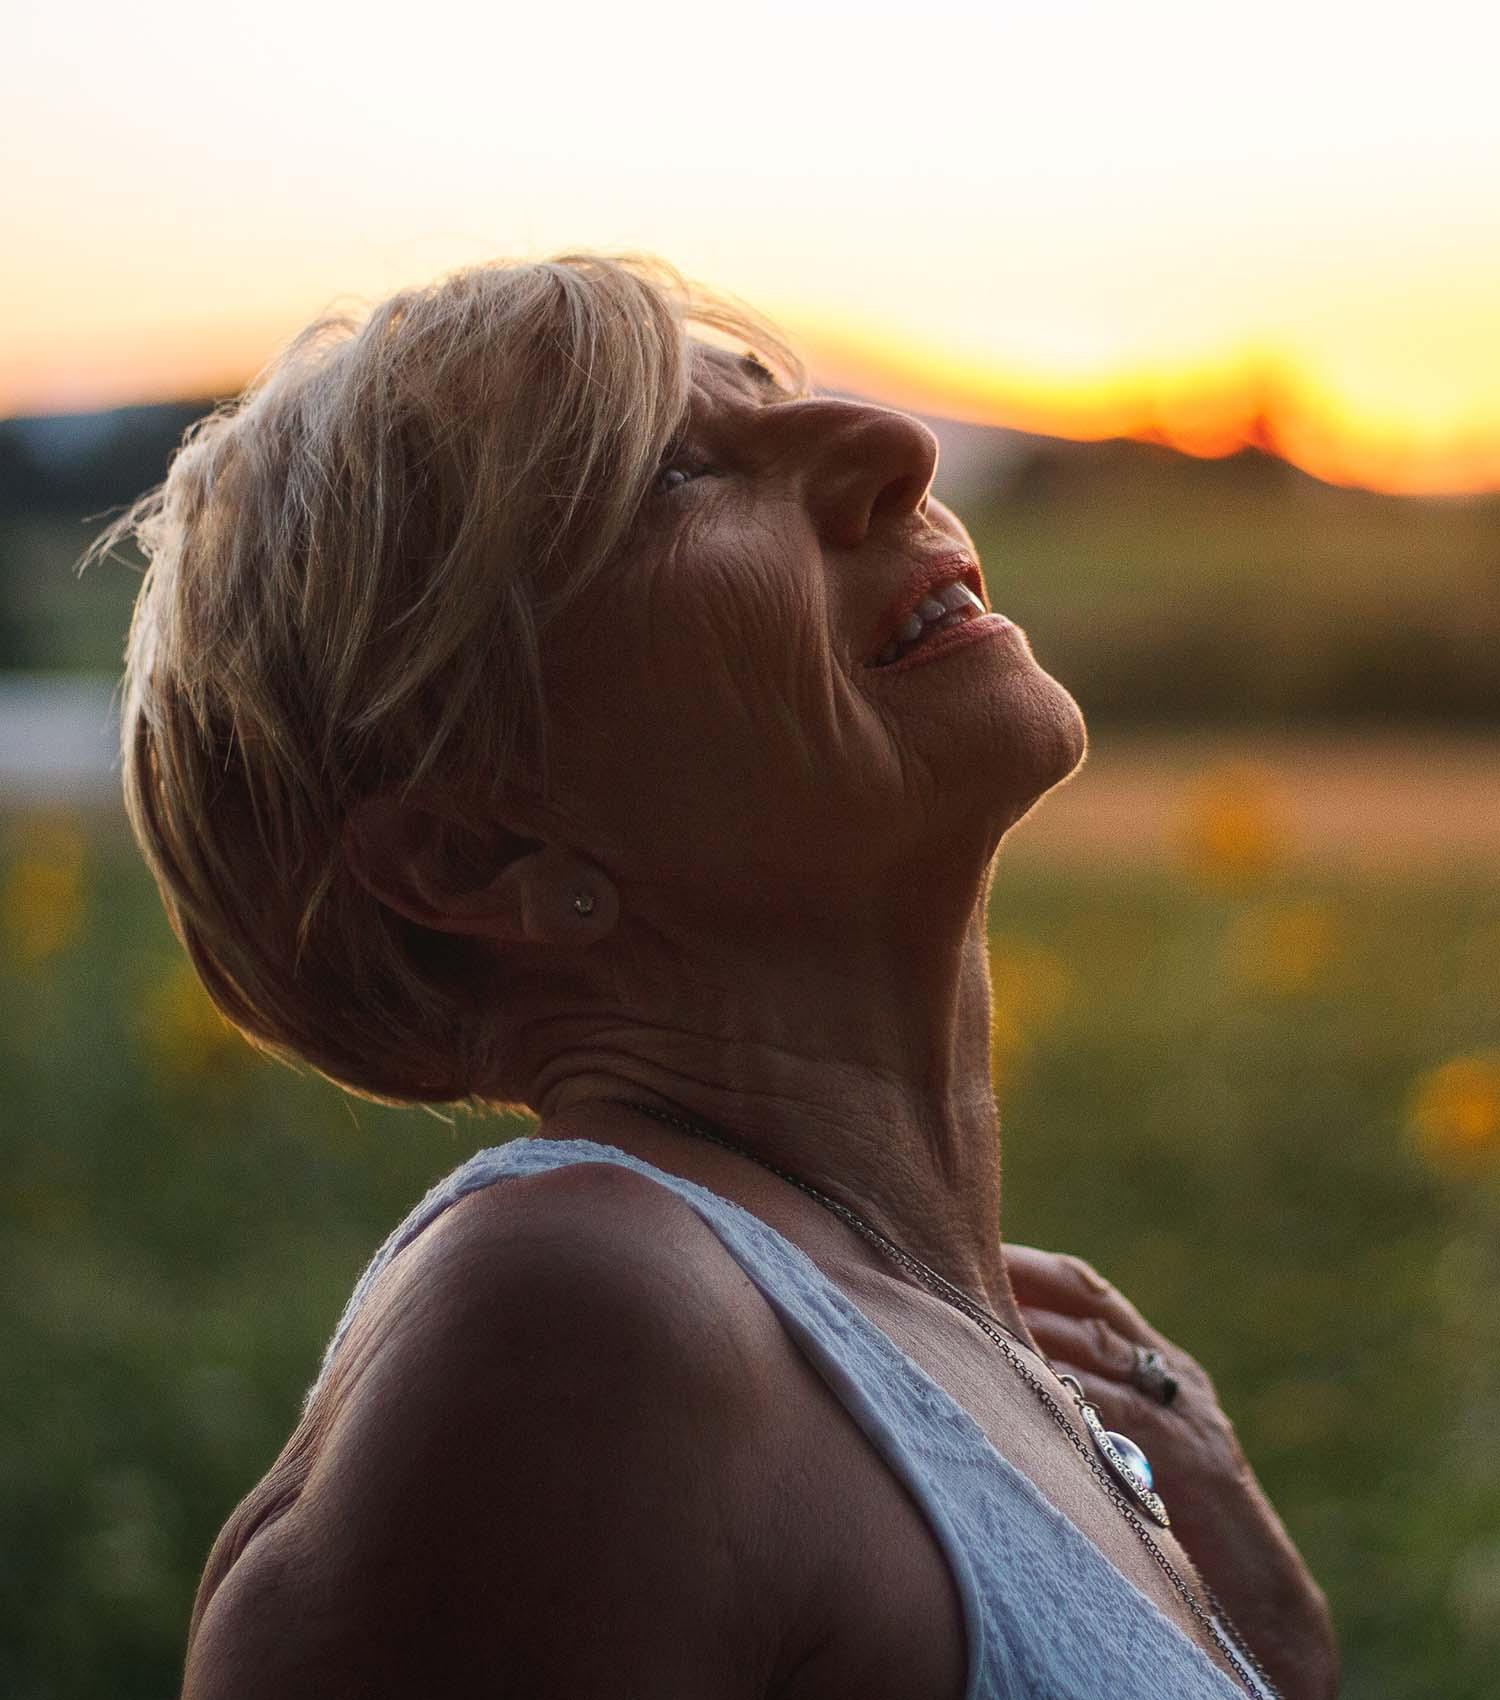 Perimenopausal woman gazing upwards in stillness as sun rises